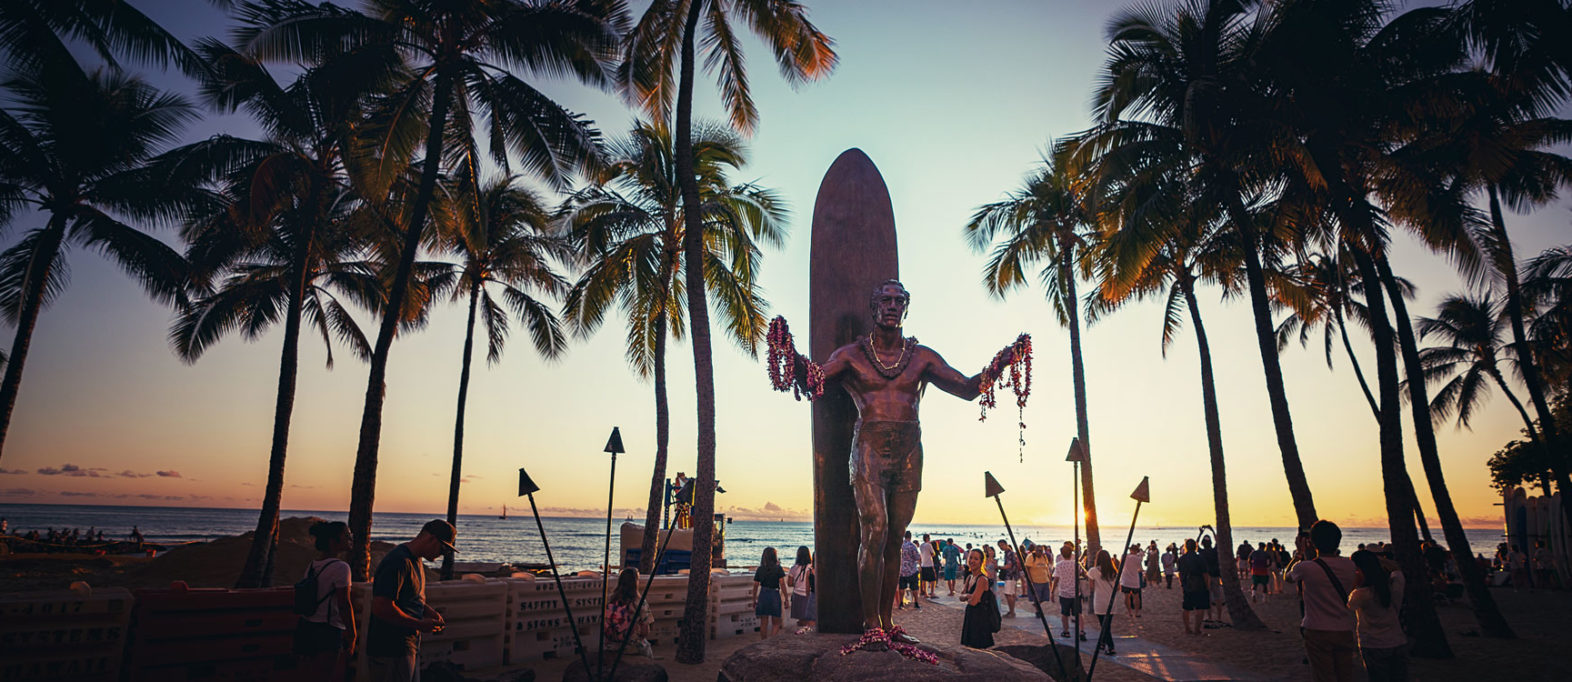 Oahu Waikiki Beach The Duke Statue